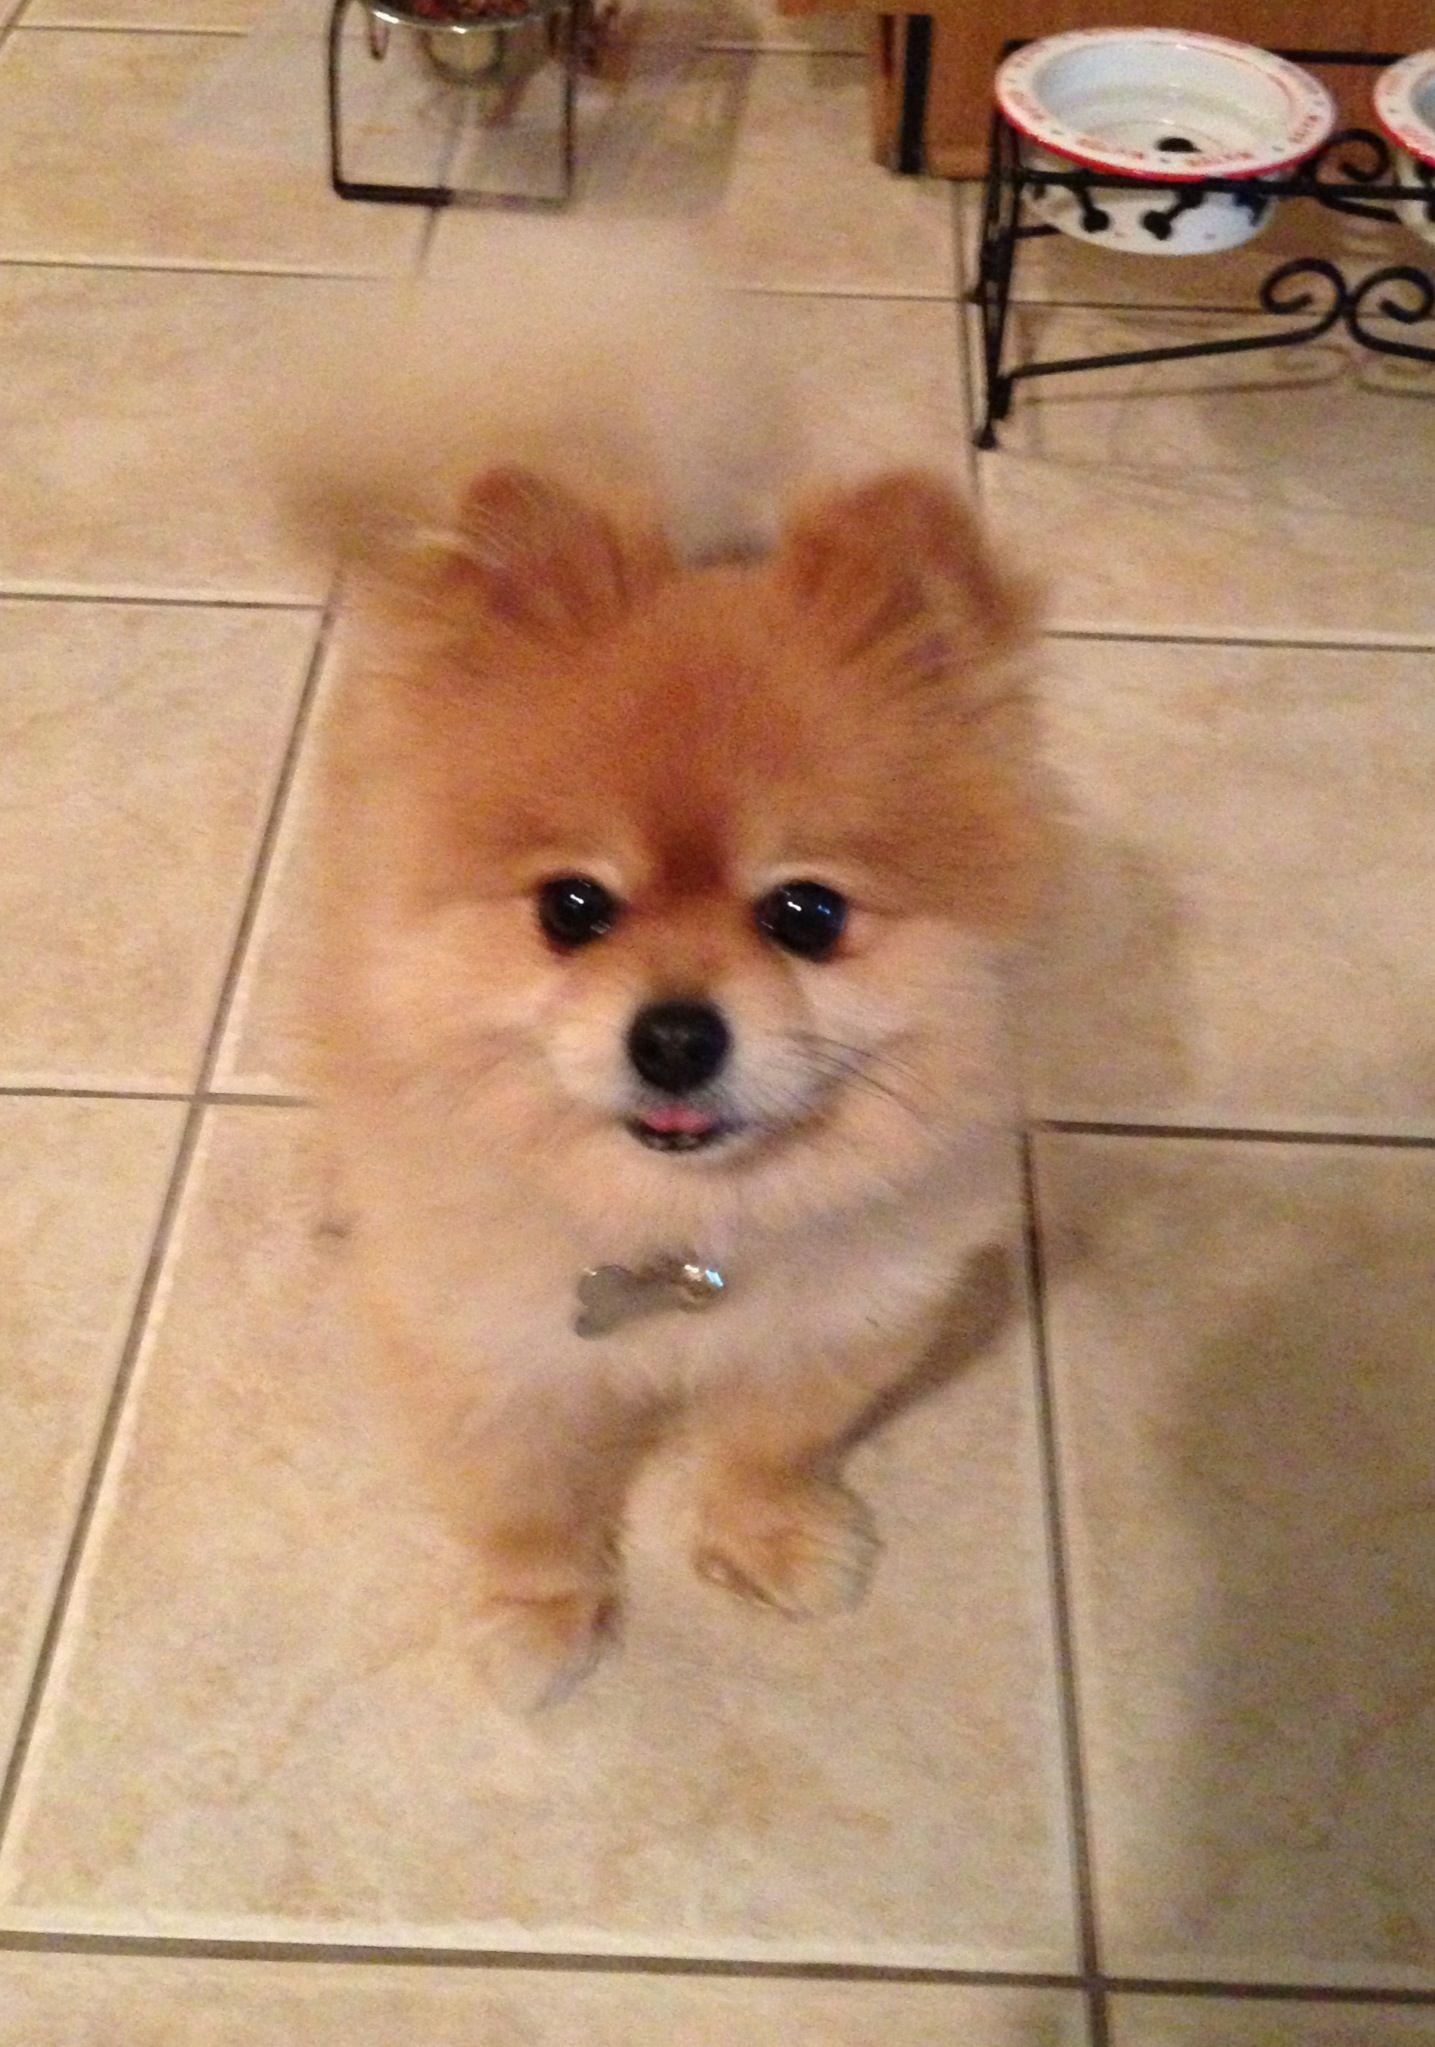 Teacup Pomeranian!! Dogs and puppies Pomeranian dog